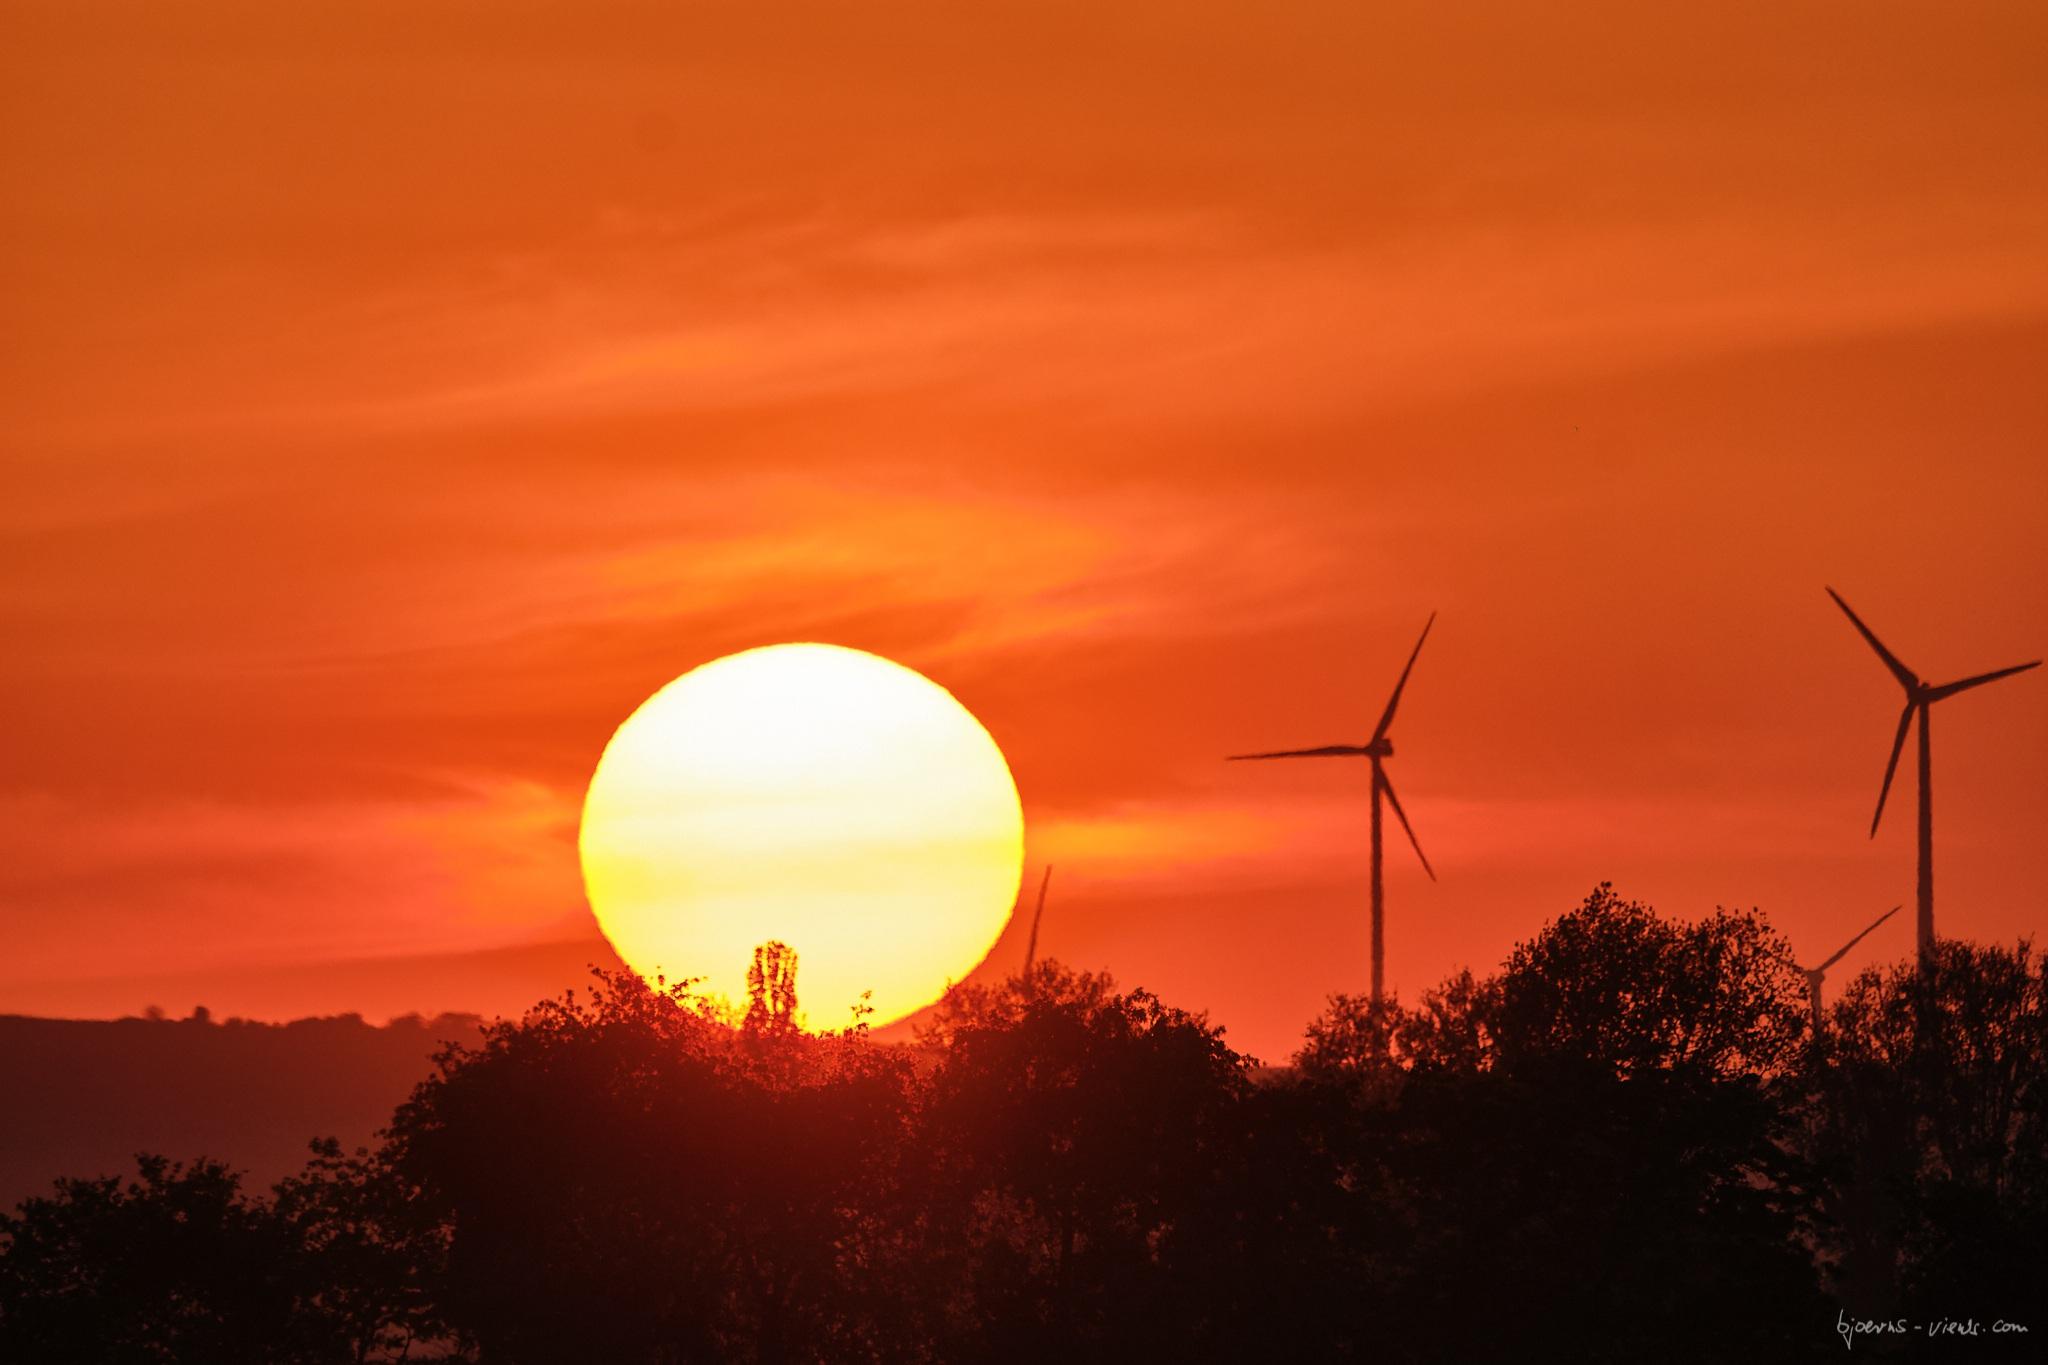 Spaziergang, Bobenheim-Roxheim, Abend, Sonne, Sonnenuntergang, Sun, Sunset